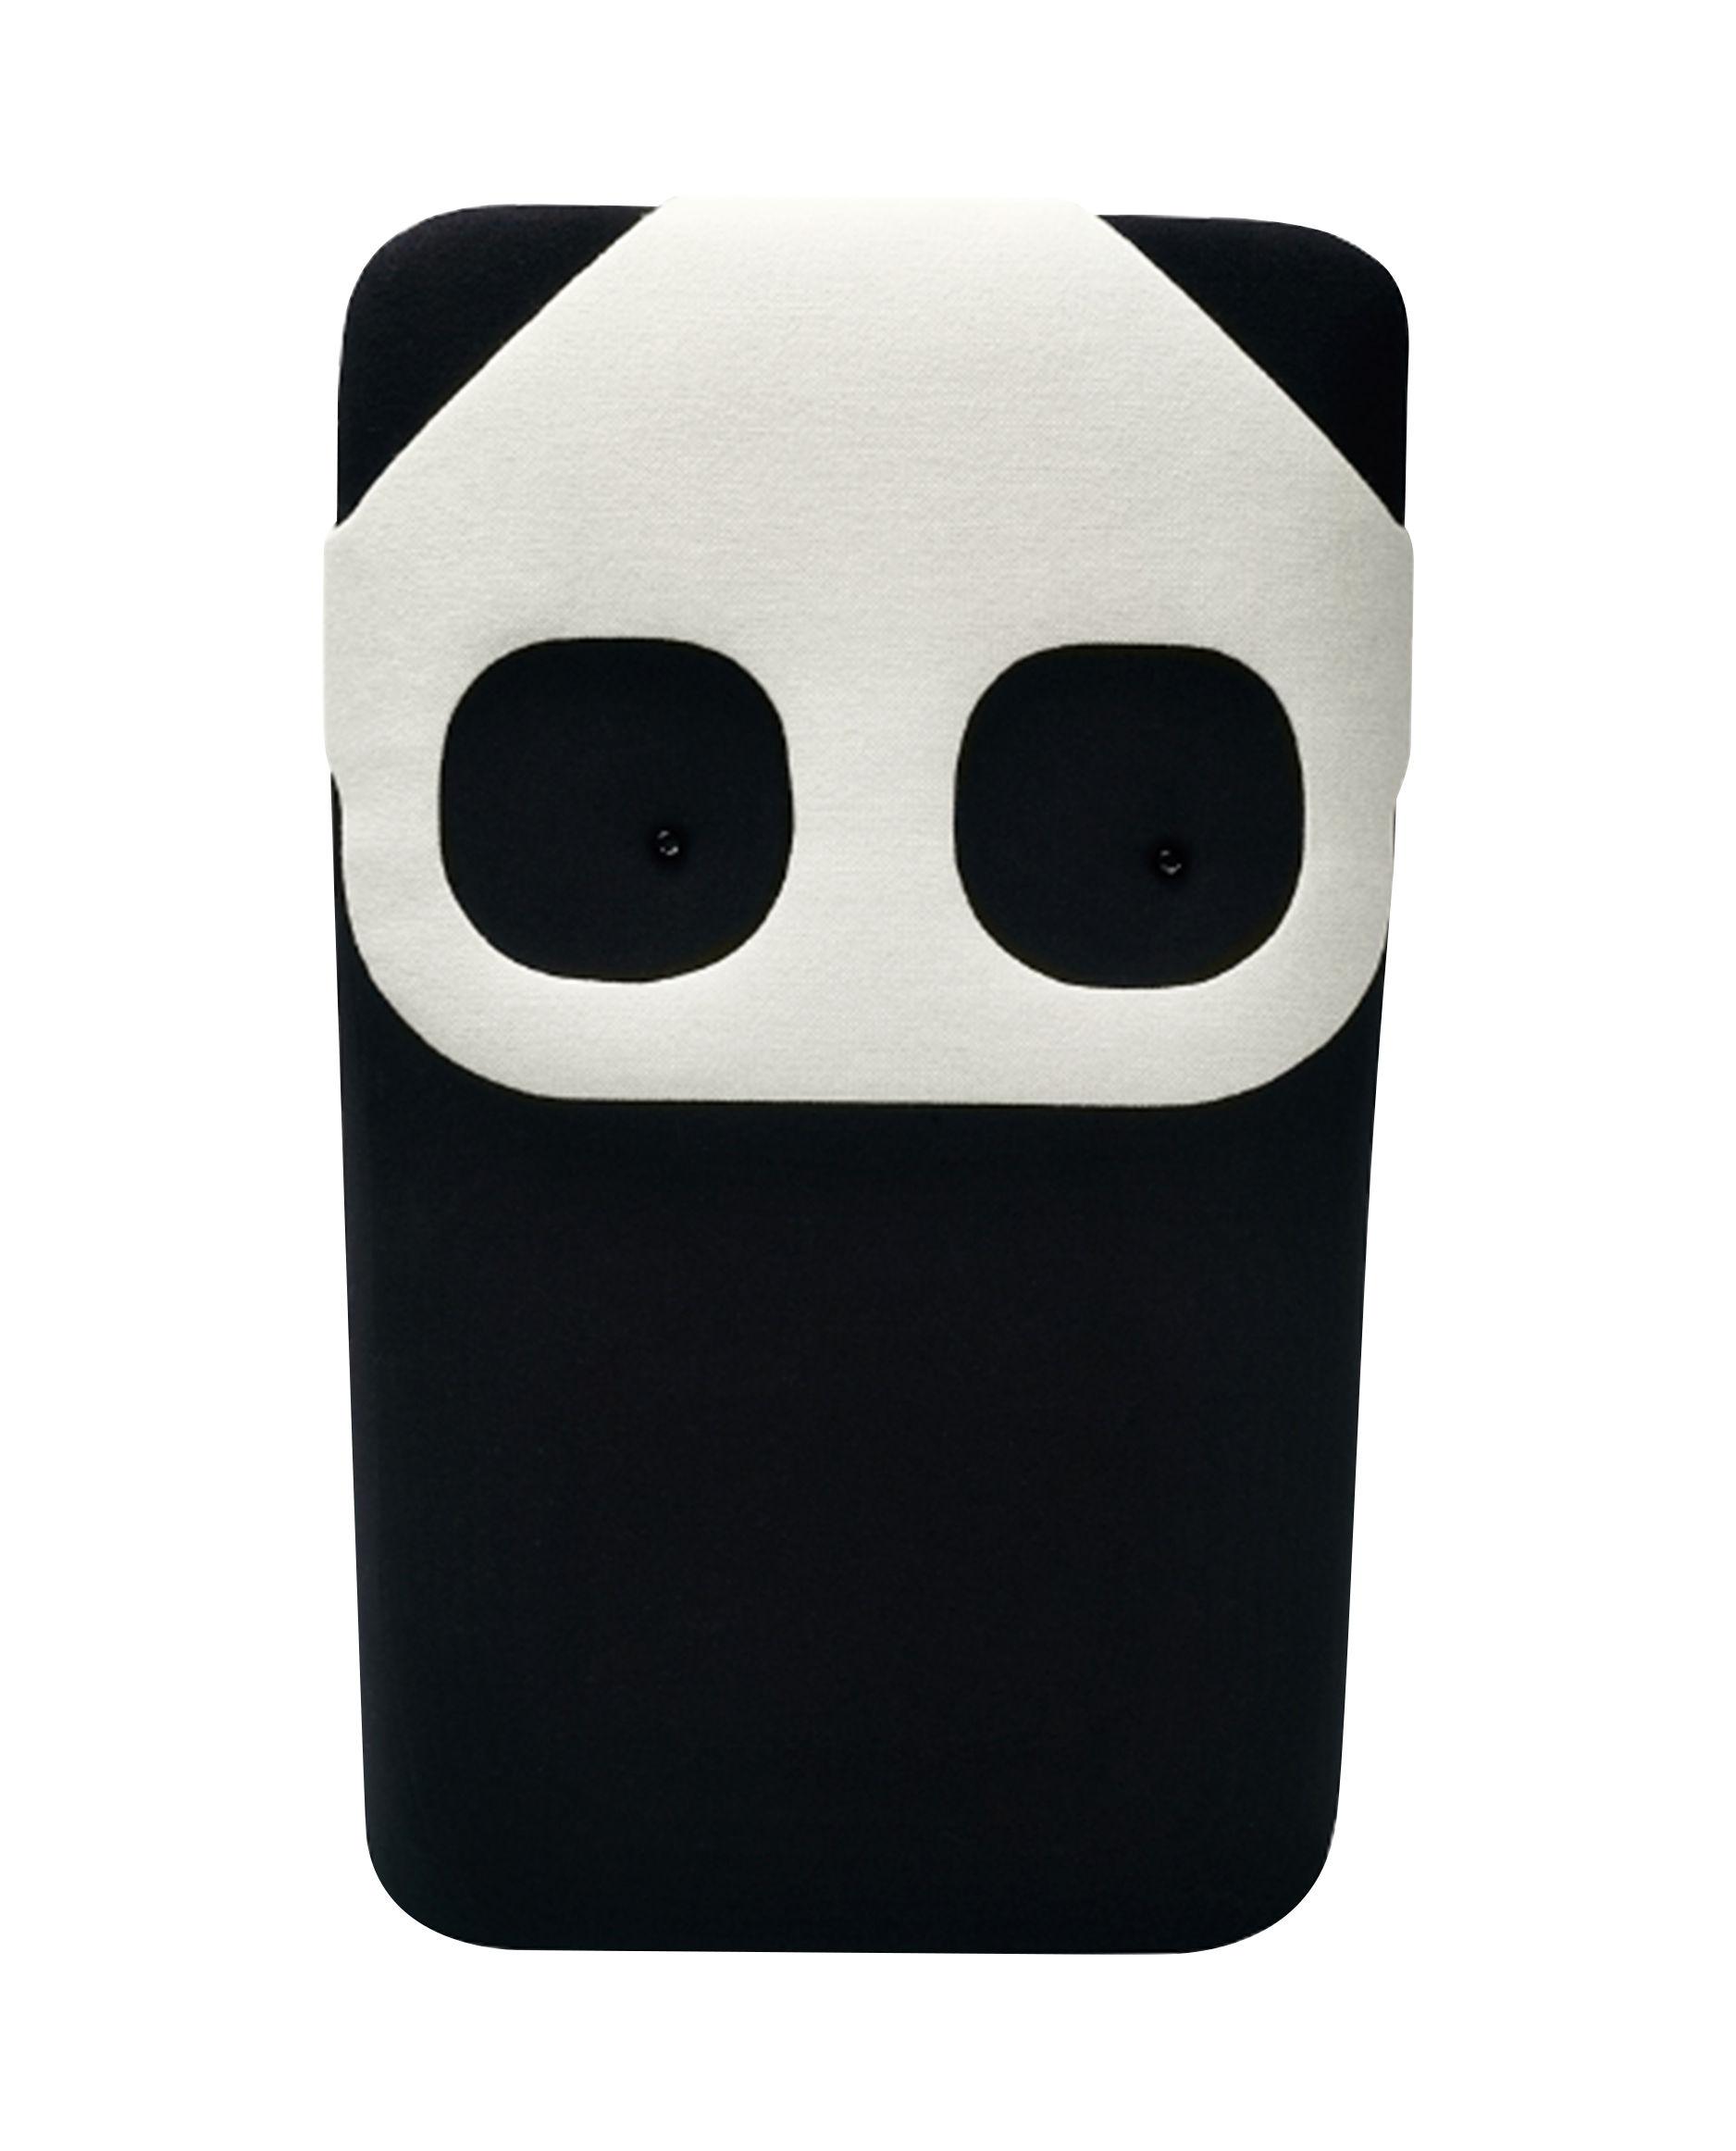 Decoration - Children's Home Accessories - Panda Mini Cushion - W 20 x H 33 cm by Elements Optimal - Black & White / Panda - Foam, Kvadrat fabric